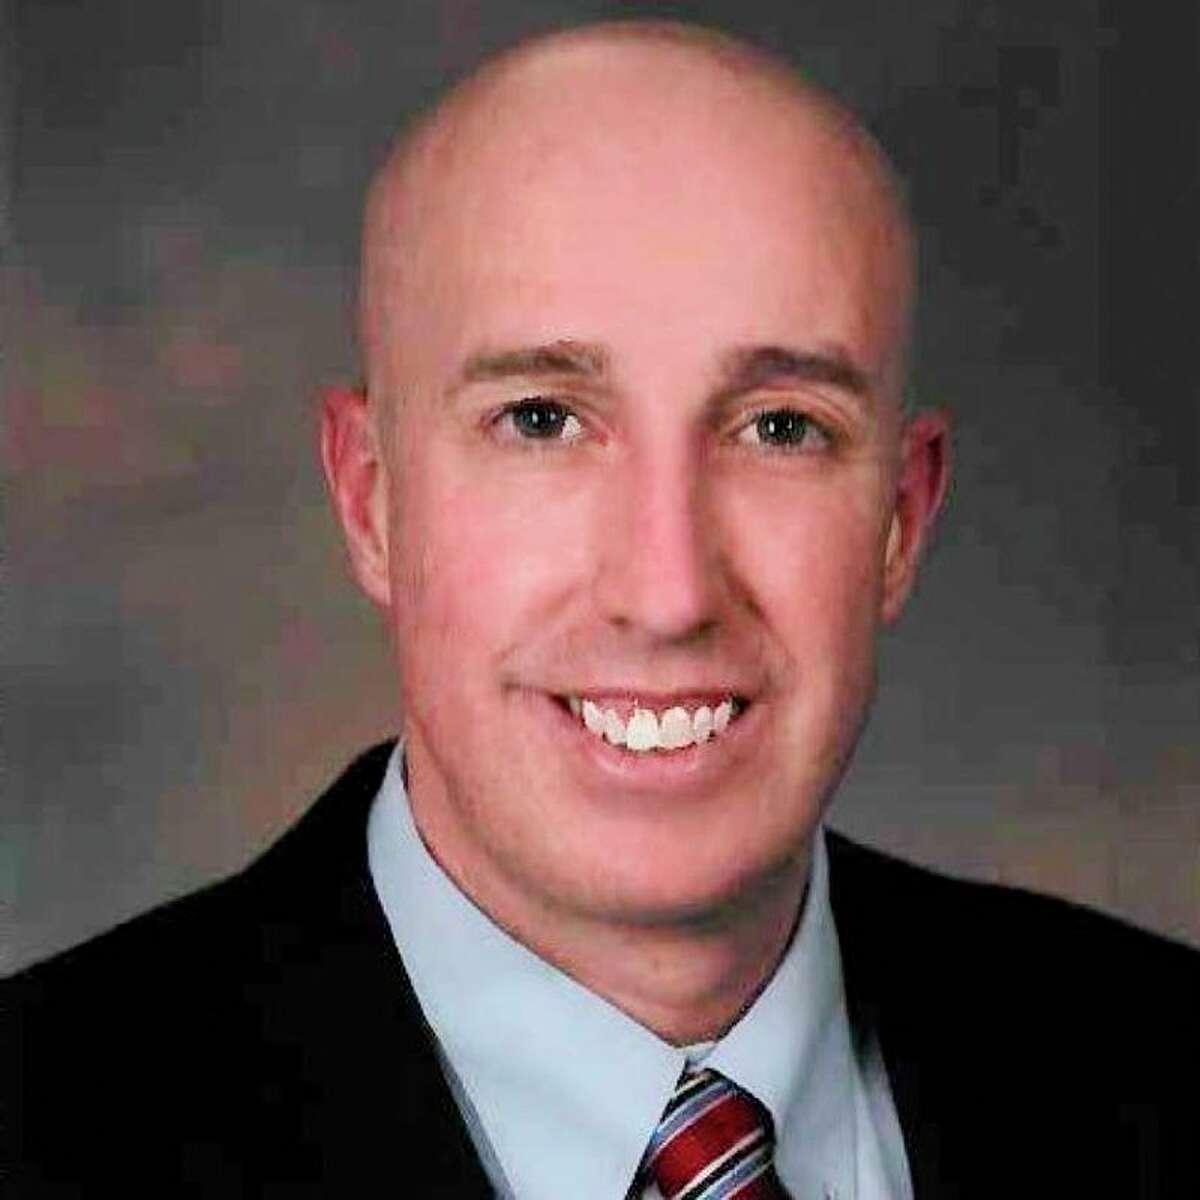 Mecosta County Sheriff Brian Miller